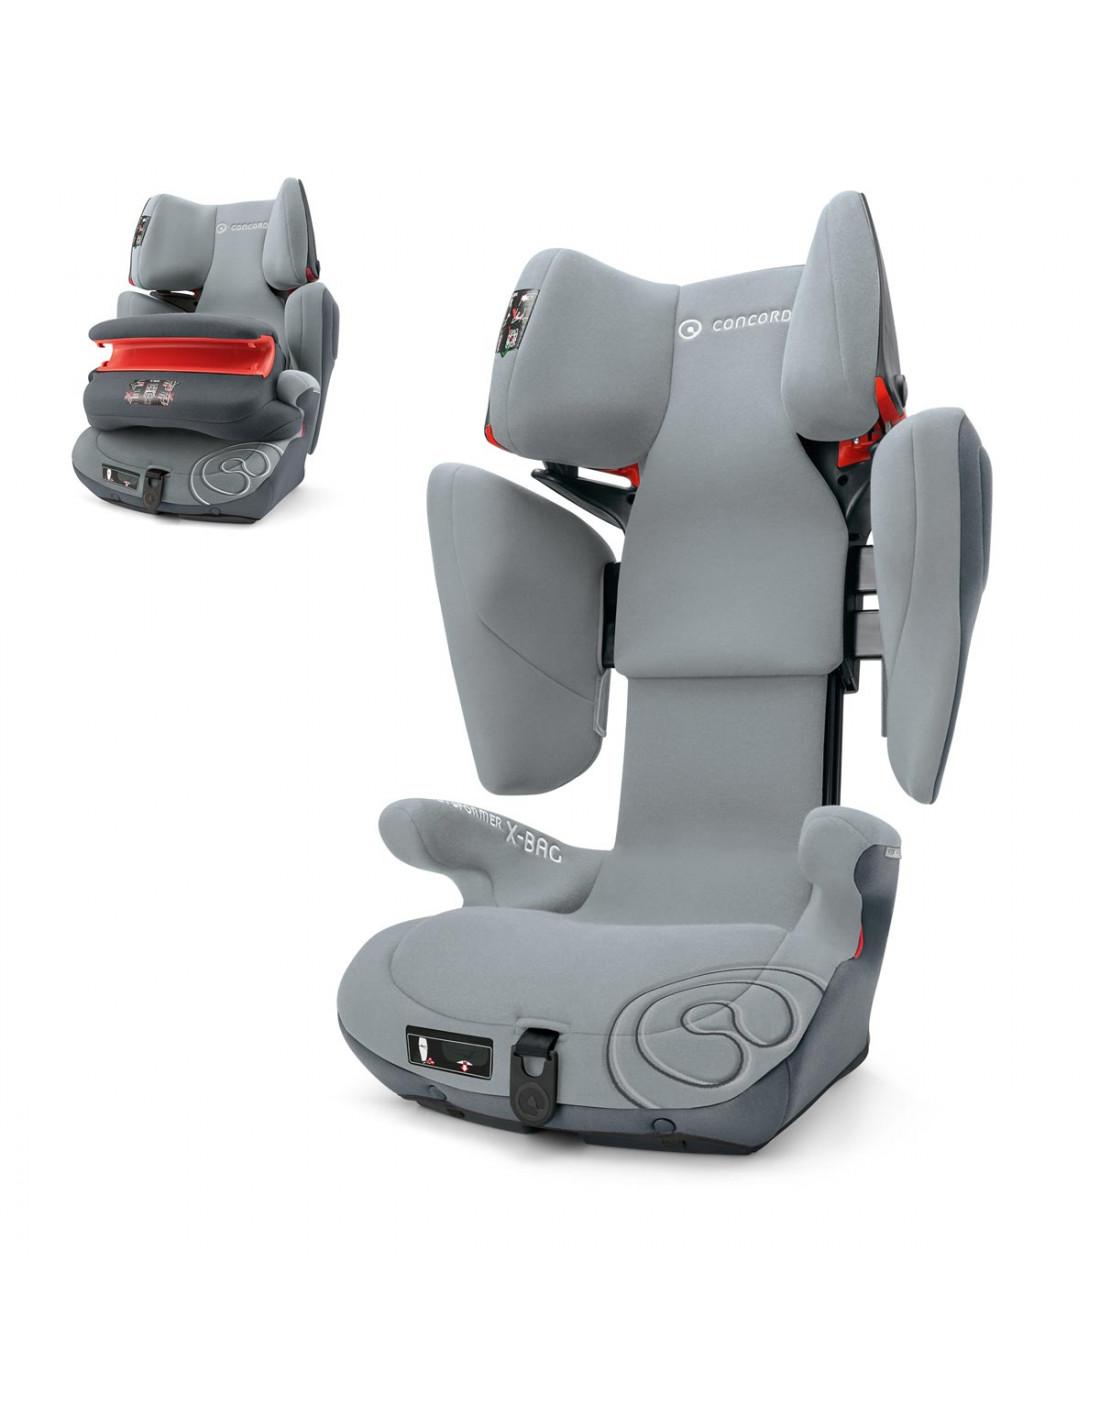 concord kindersitz transformer pro gr 1 2 3 graphite grey. Black Bedroom Furniture Sets. Home Design Ideas